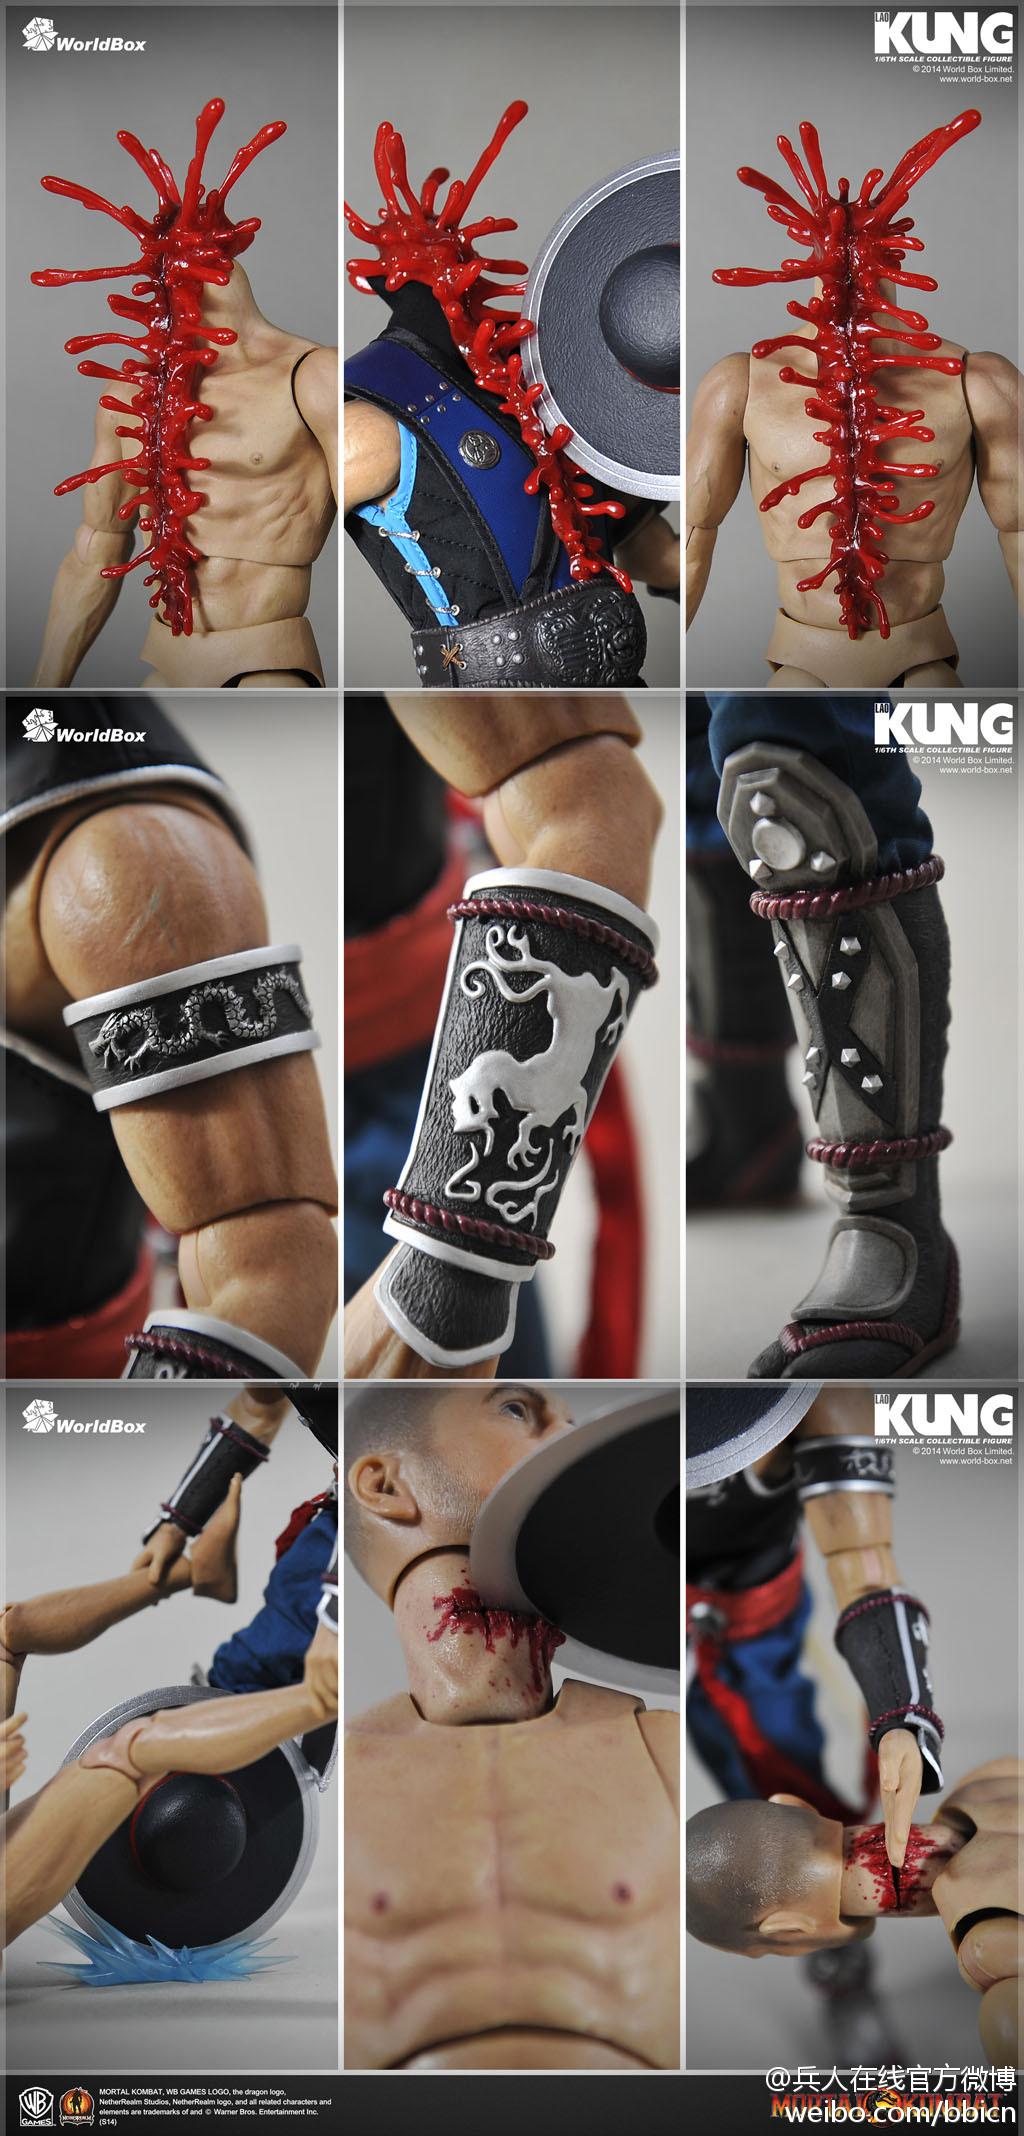 [World Box] Mortal Kombat: Kung Lao Lançado!! 69381c07gw1egm0mvlqcrj20sg1nc7gz